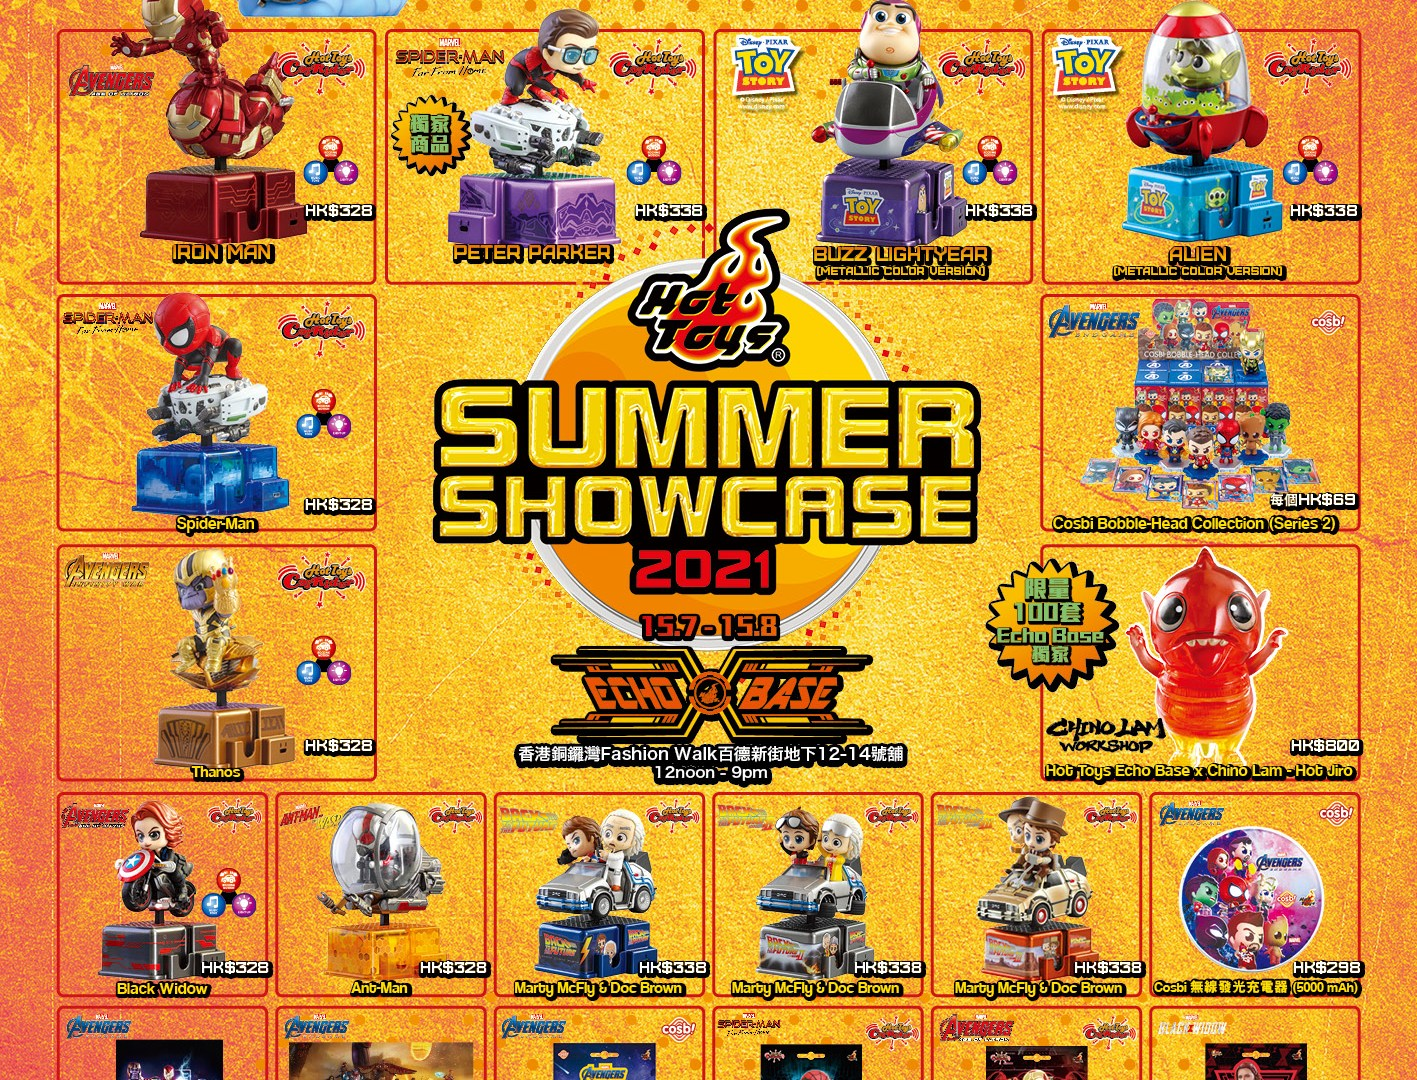 Hot Toys Summer Showcase